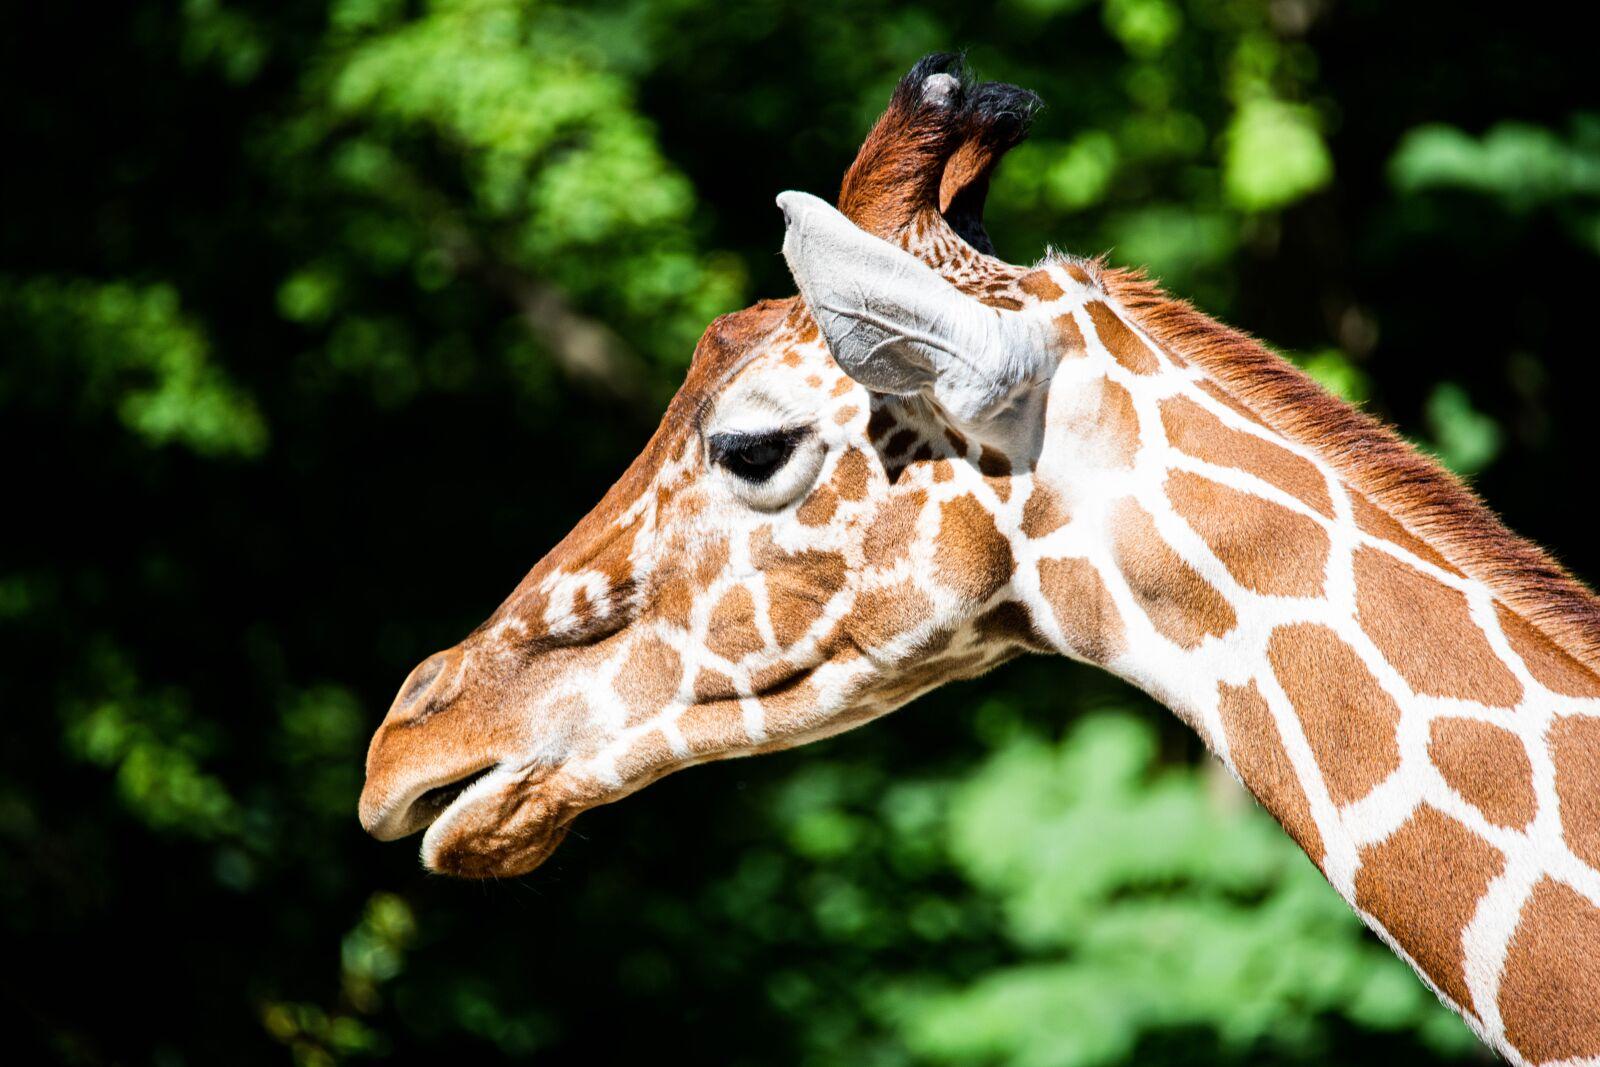 giraffe, africa, portrait